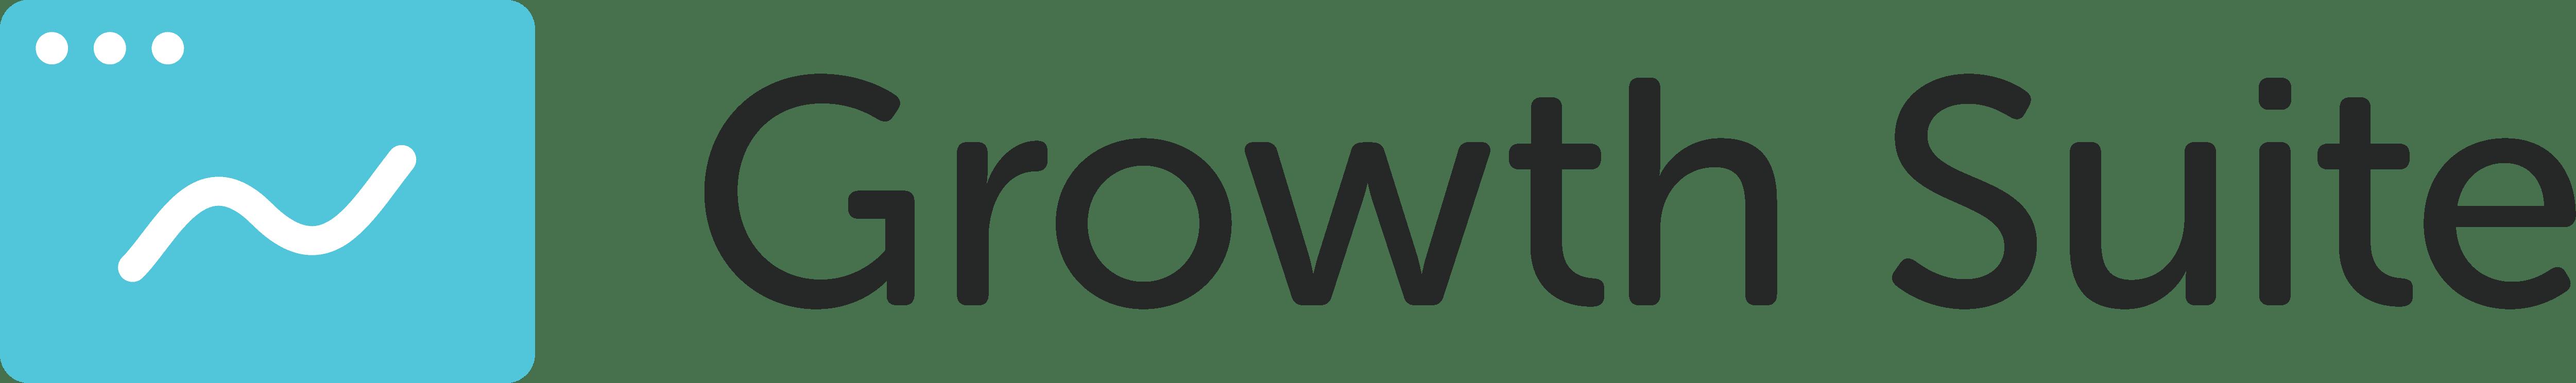 Growth-Suite-Logo-_1_